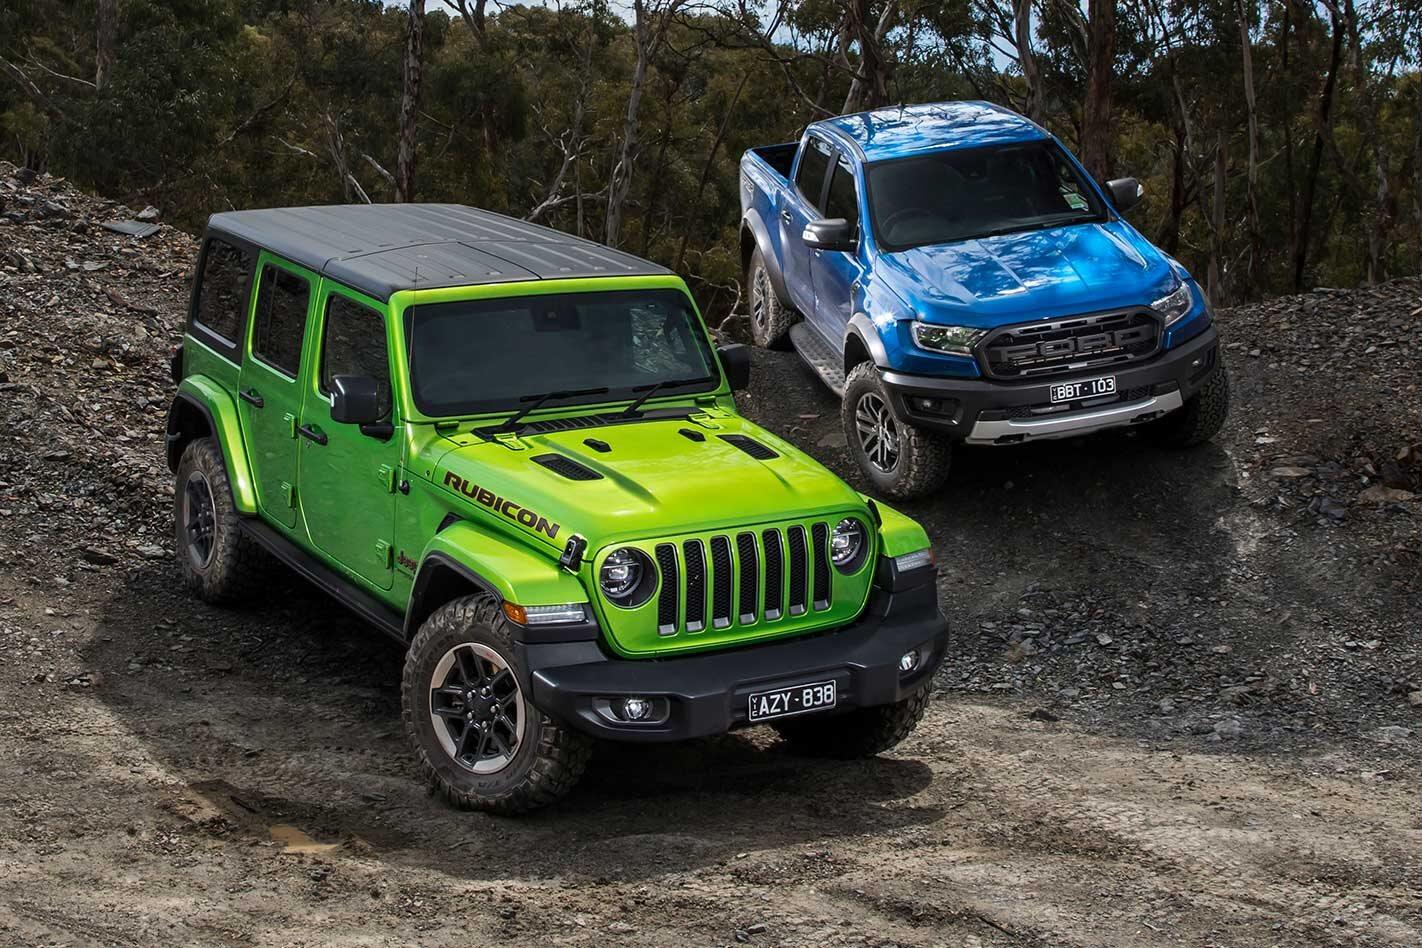 Ford Ranger Raptor vs Jeep Wrangler Rubicon comparison